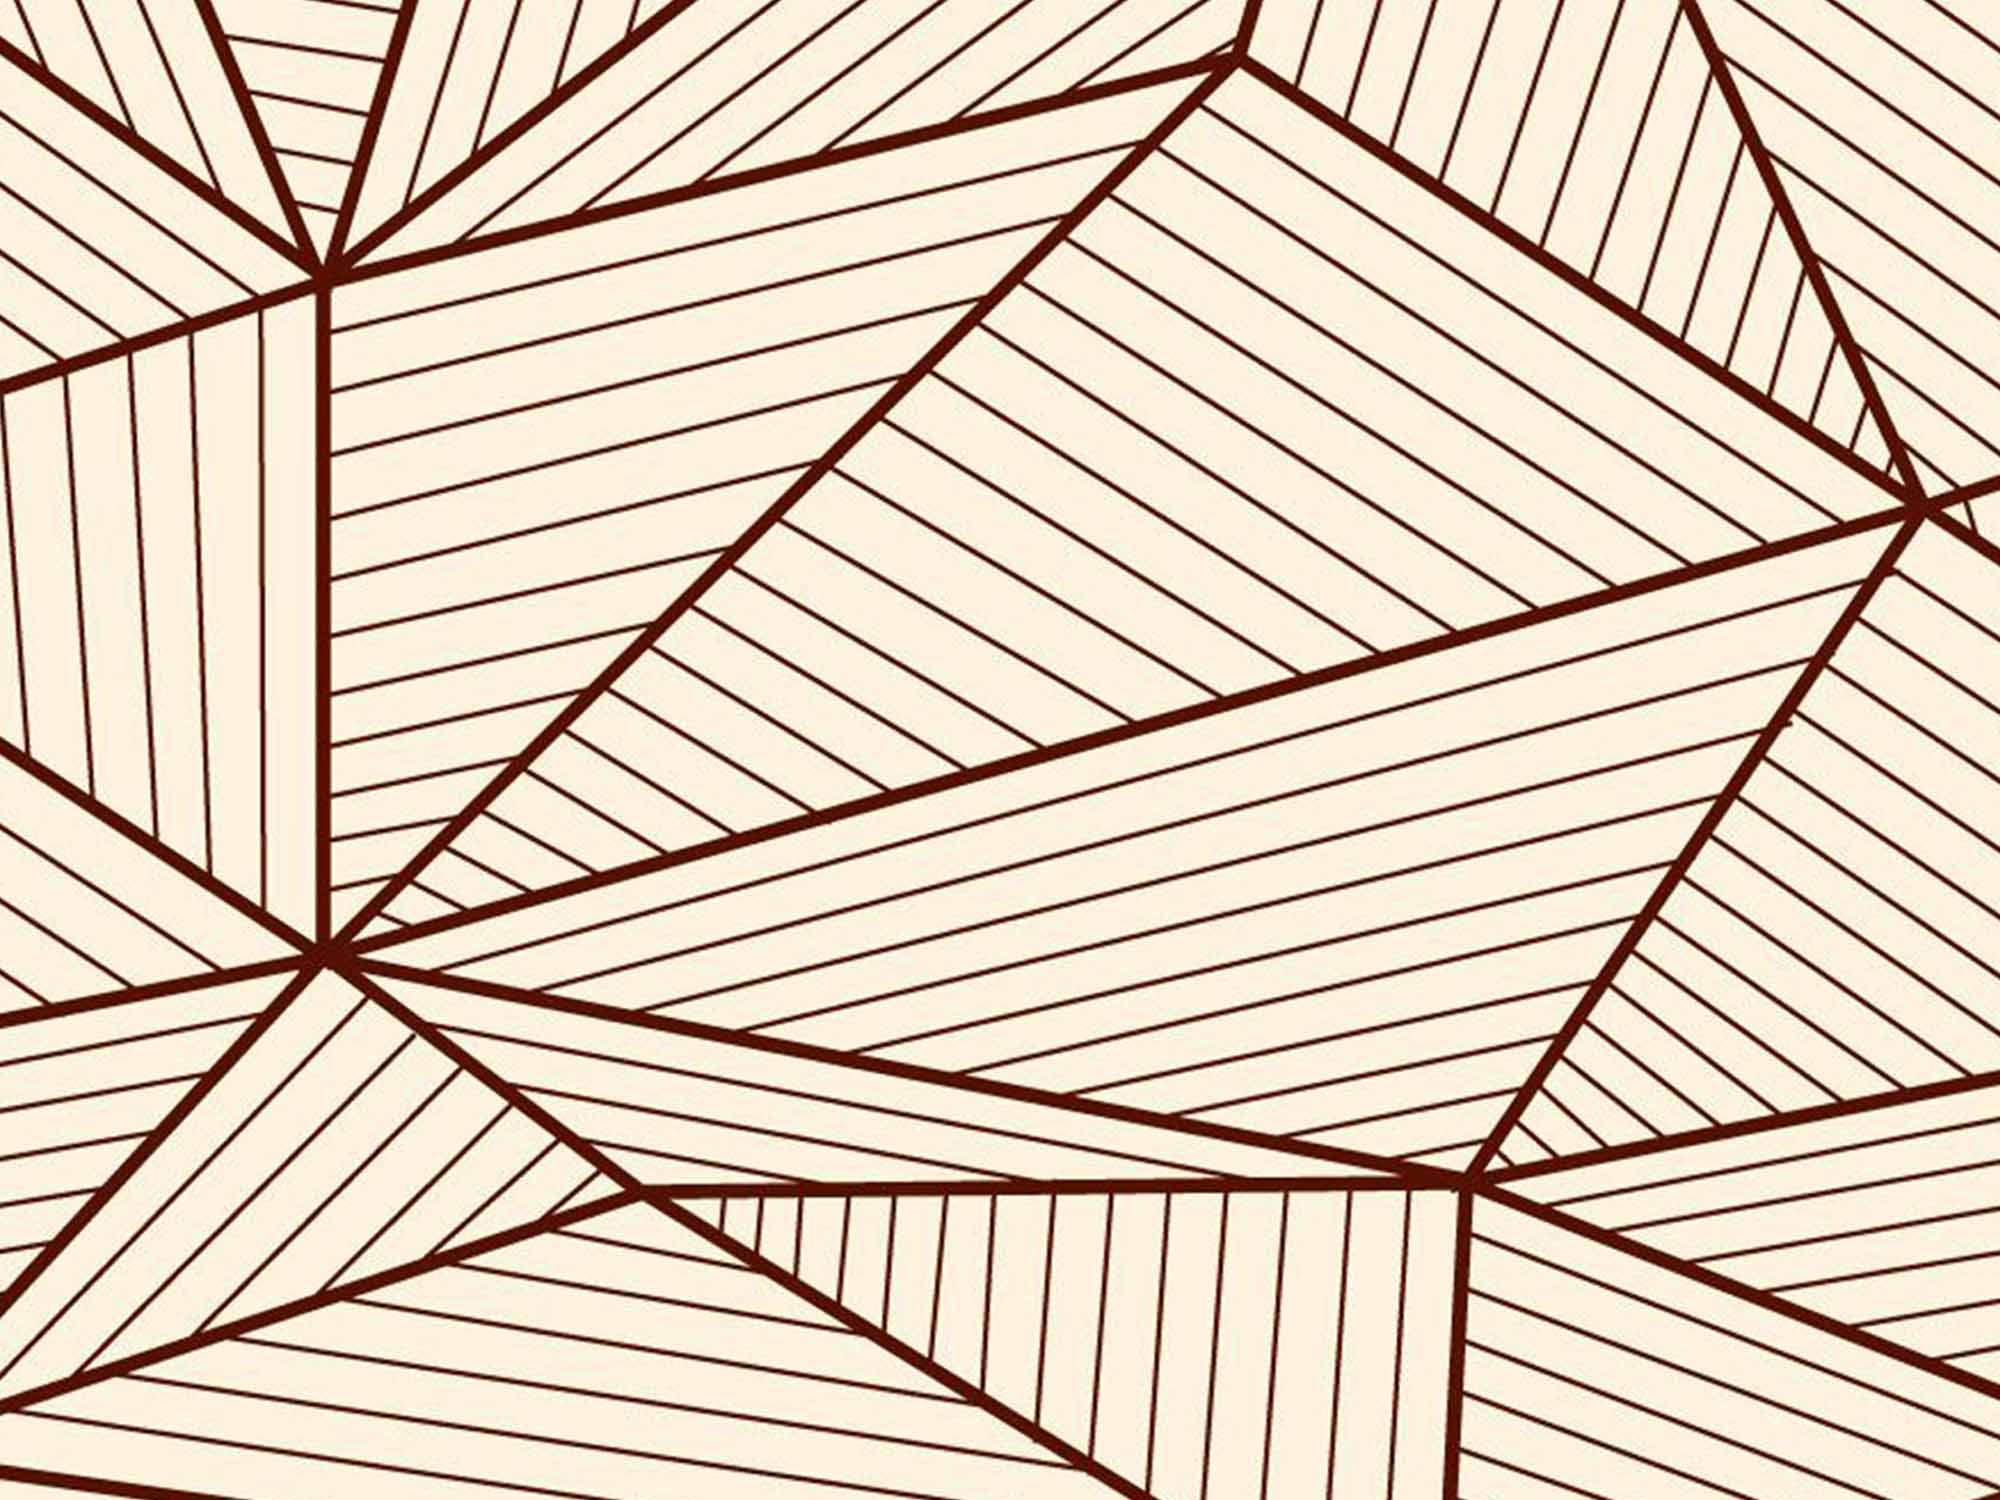 Papel de Parede para Sala Geométrico 0082 - Adesivos de Parede  - Paredes Decoradas